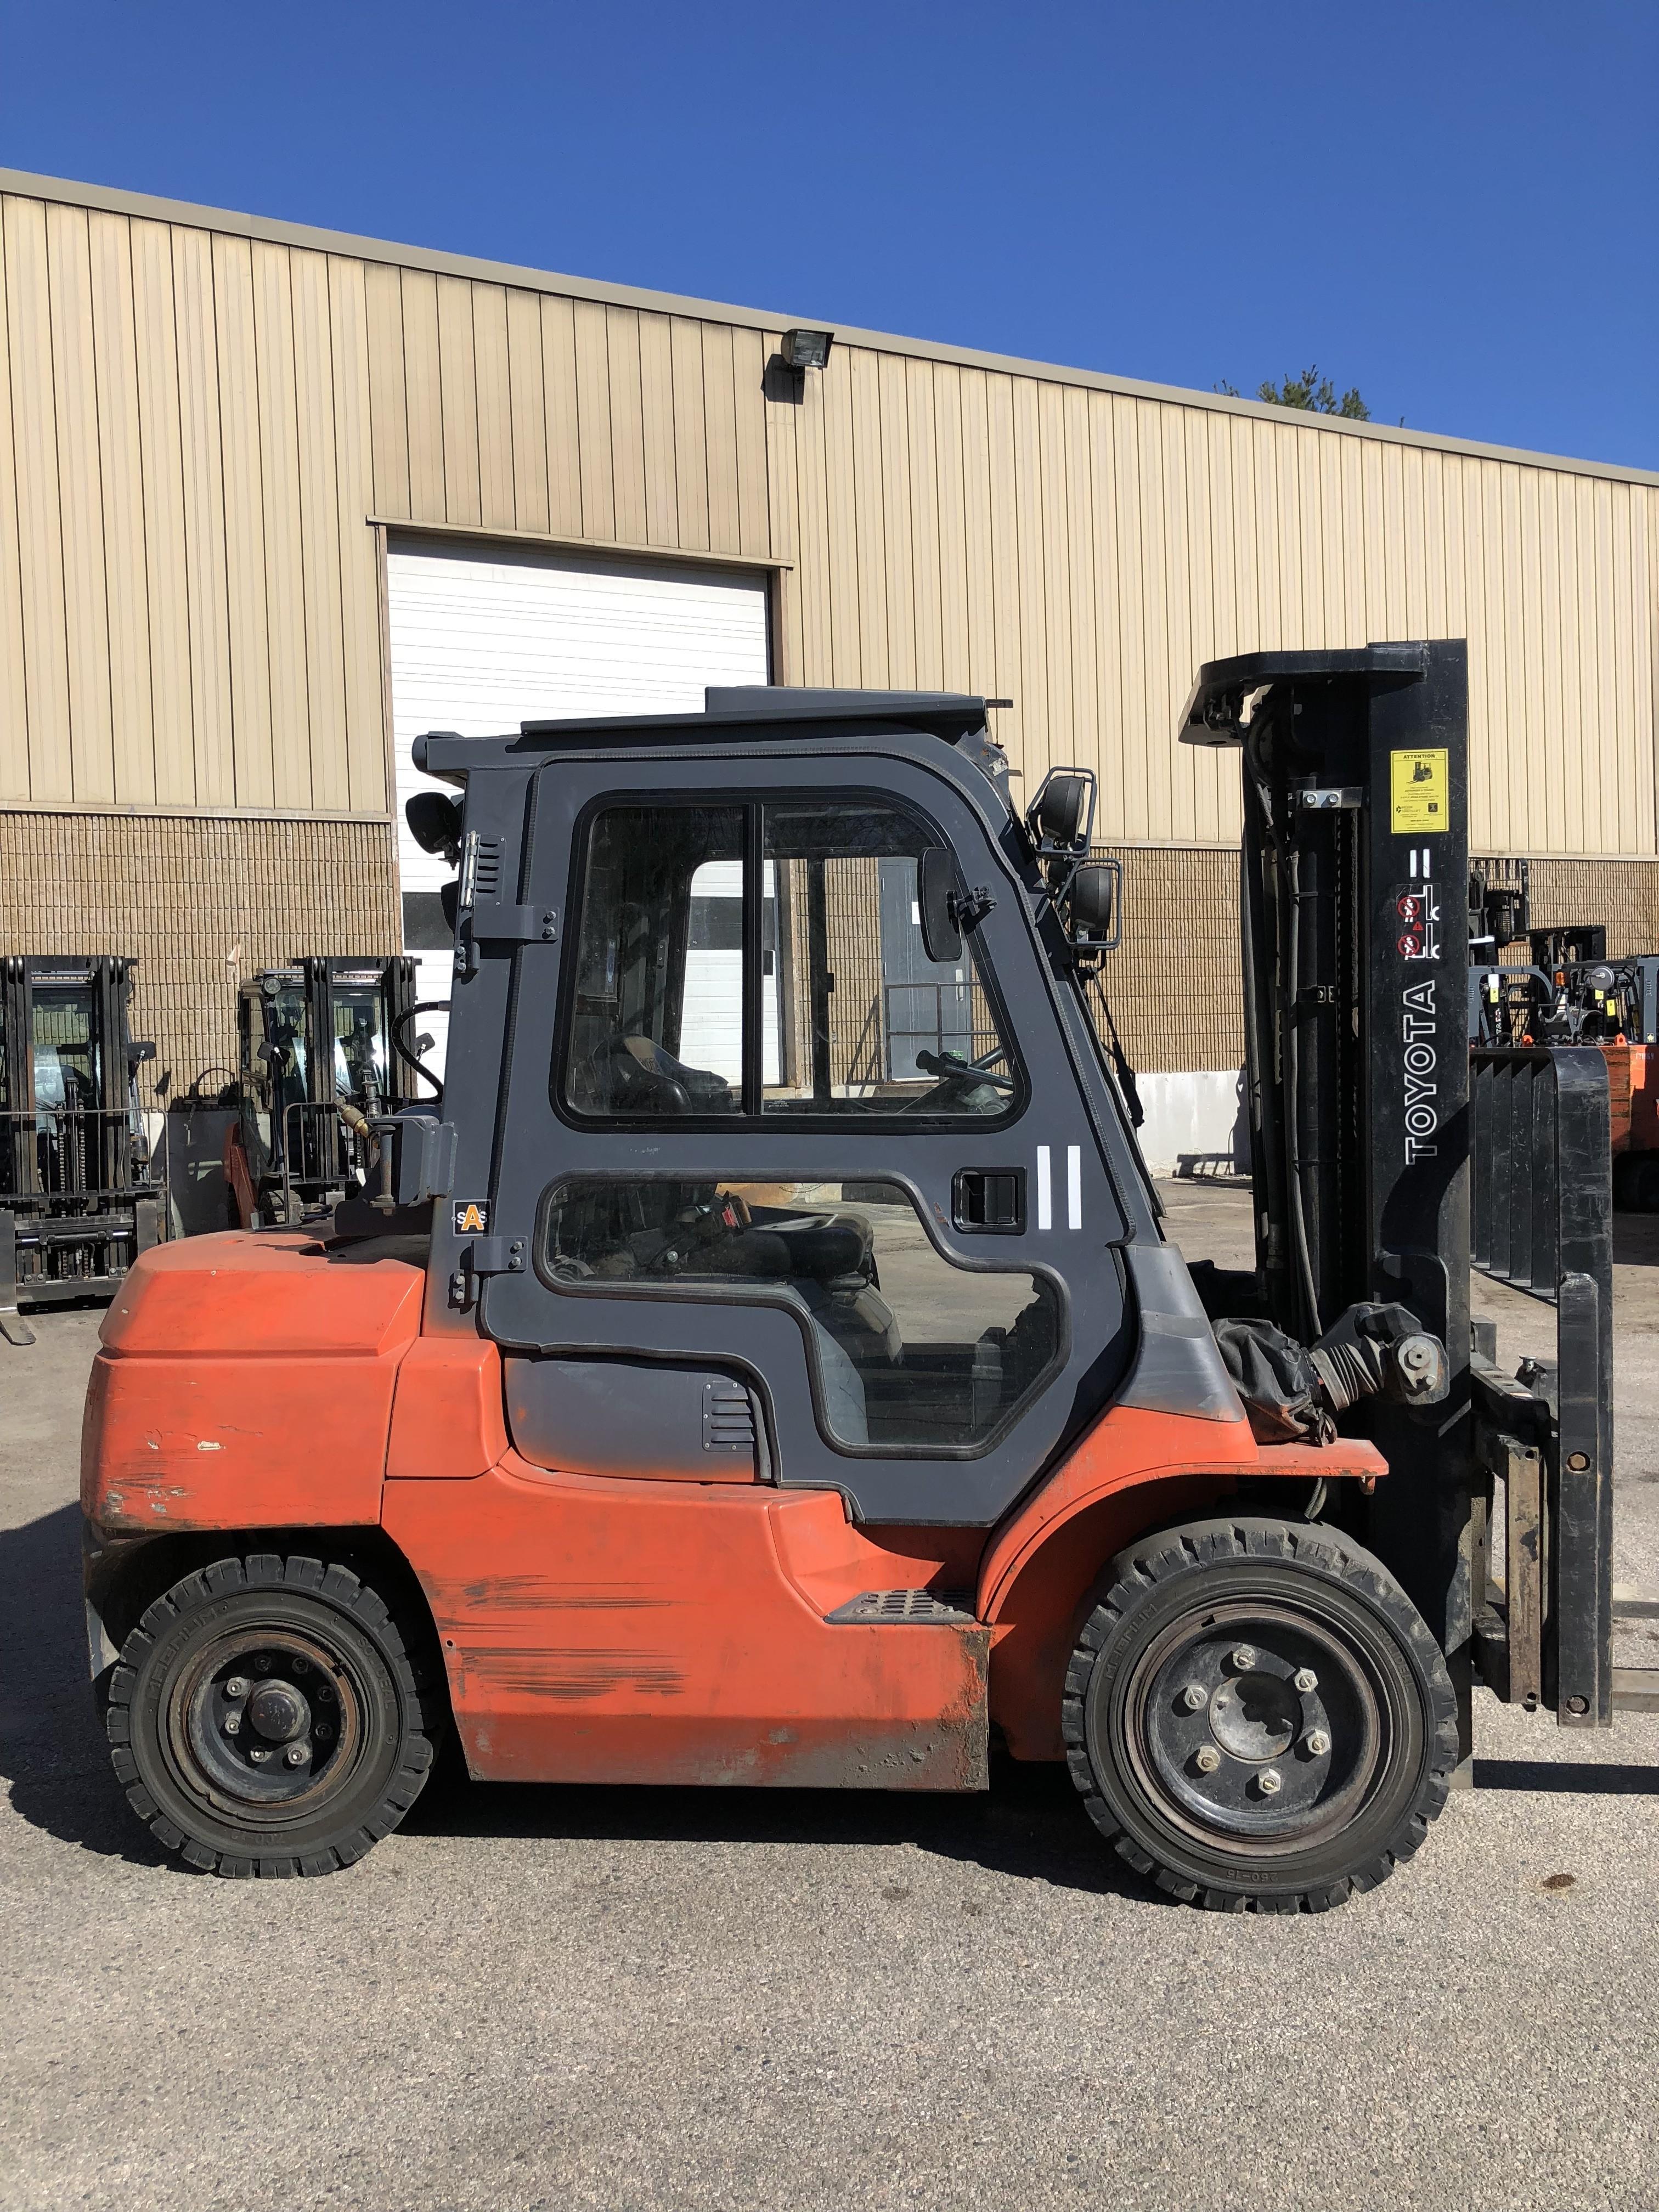 Used, 2012, Toyota Industrial Equipment, 7FGU35, Forklifts / Lift Trucks